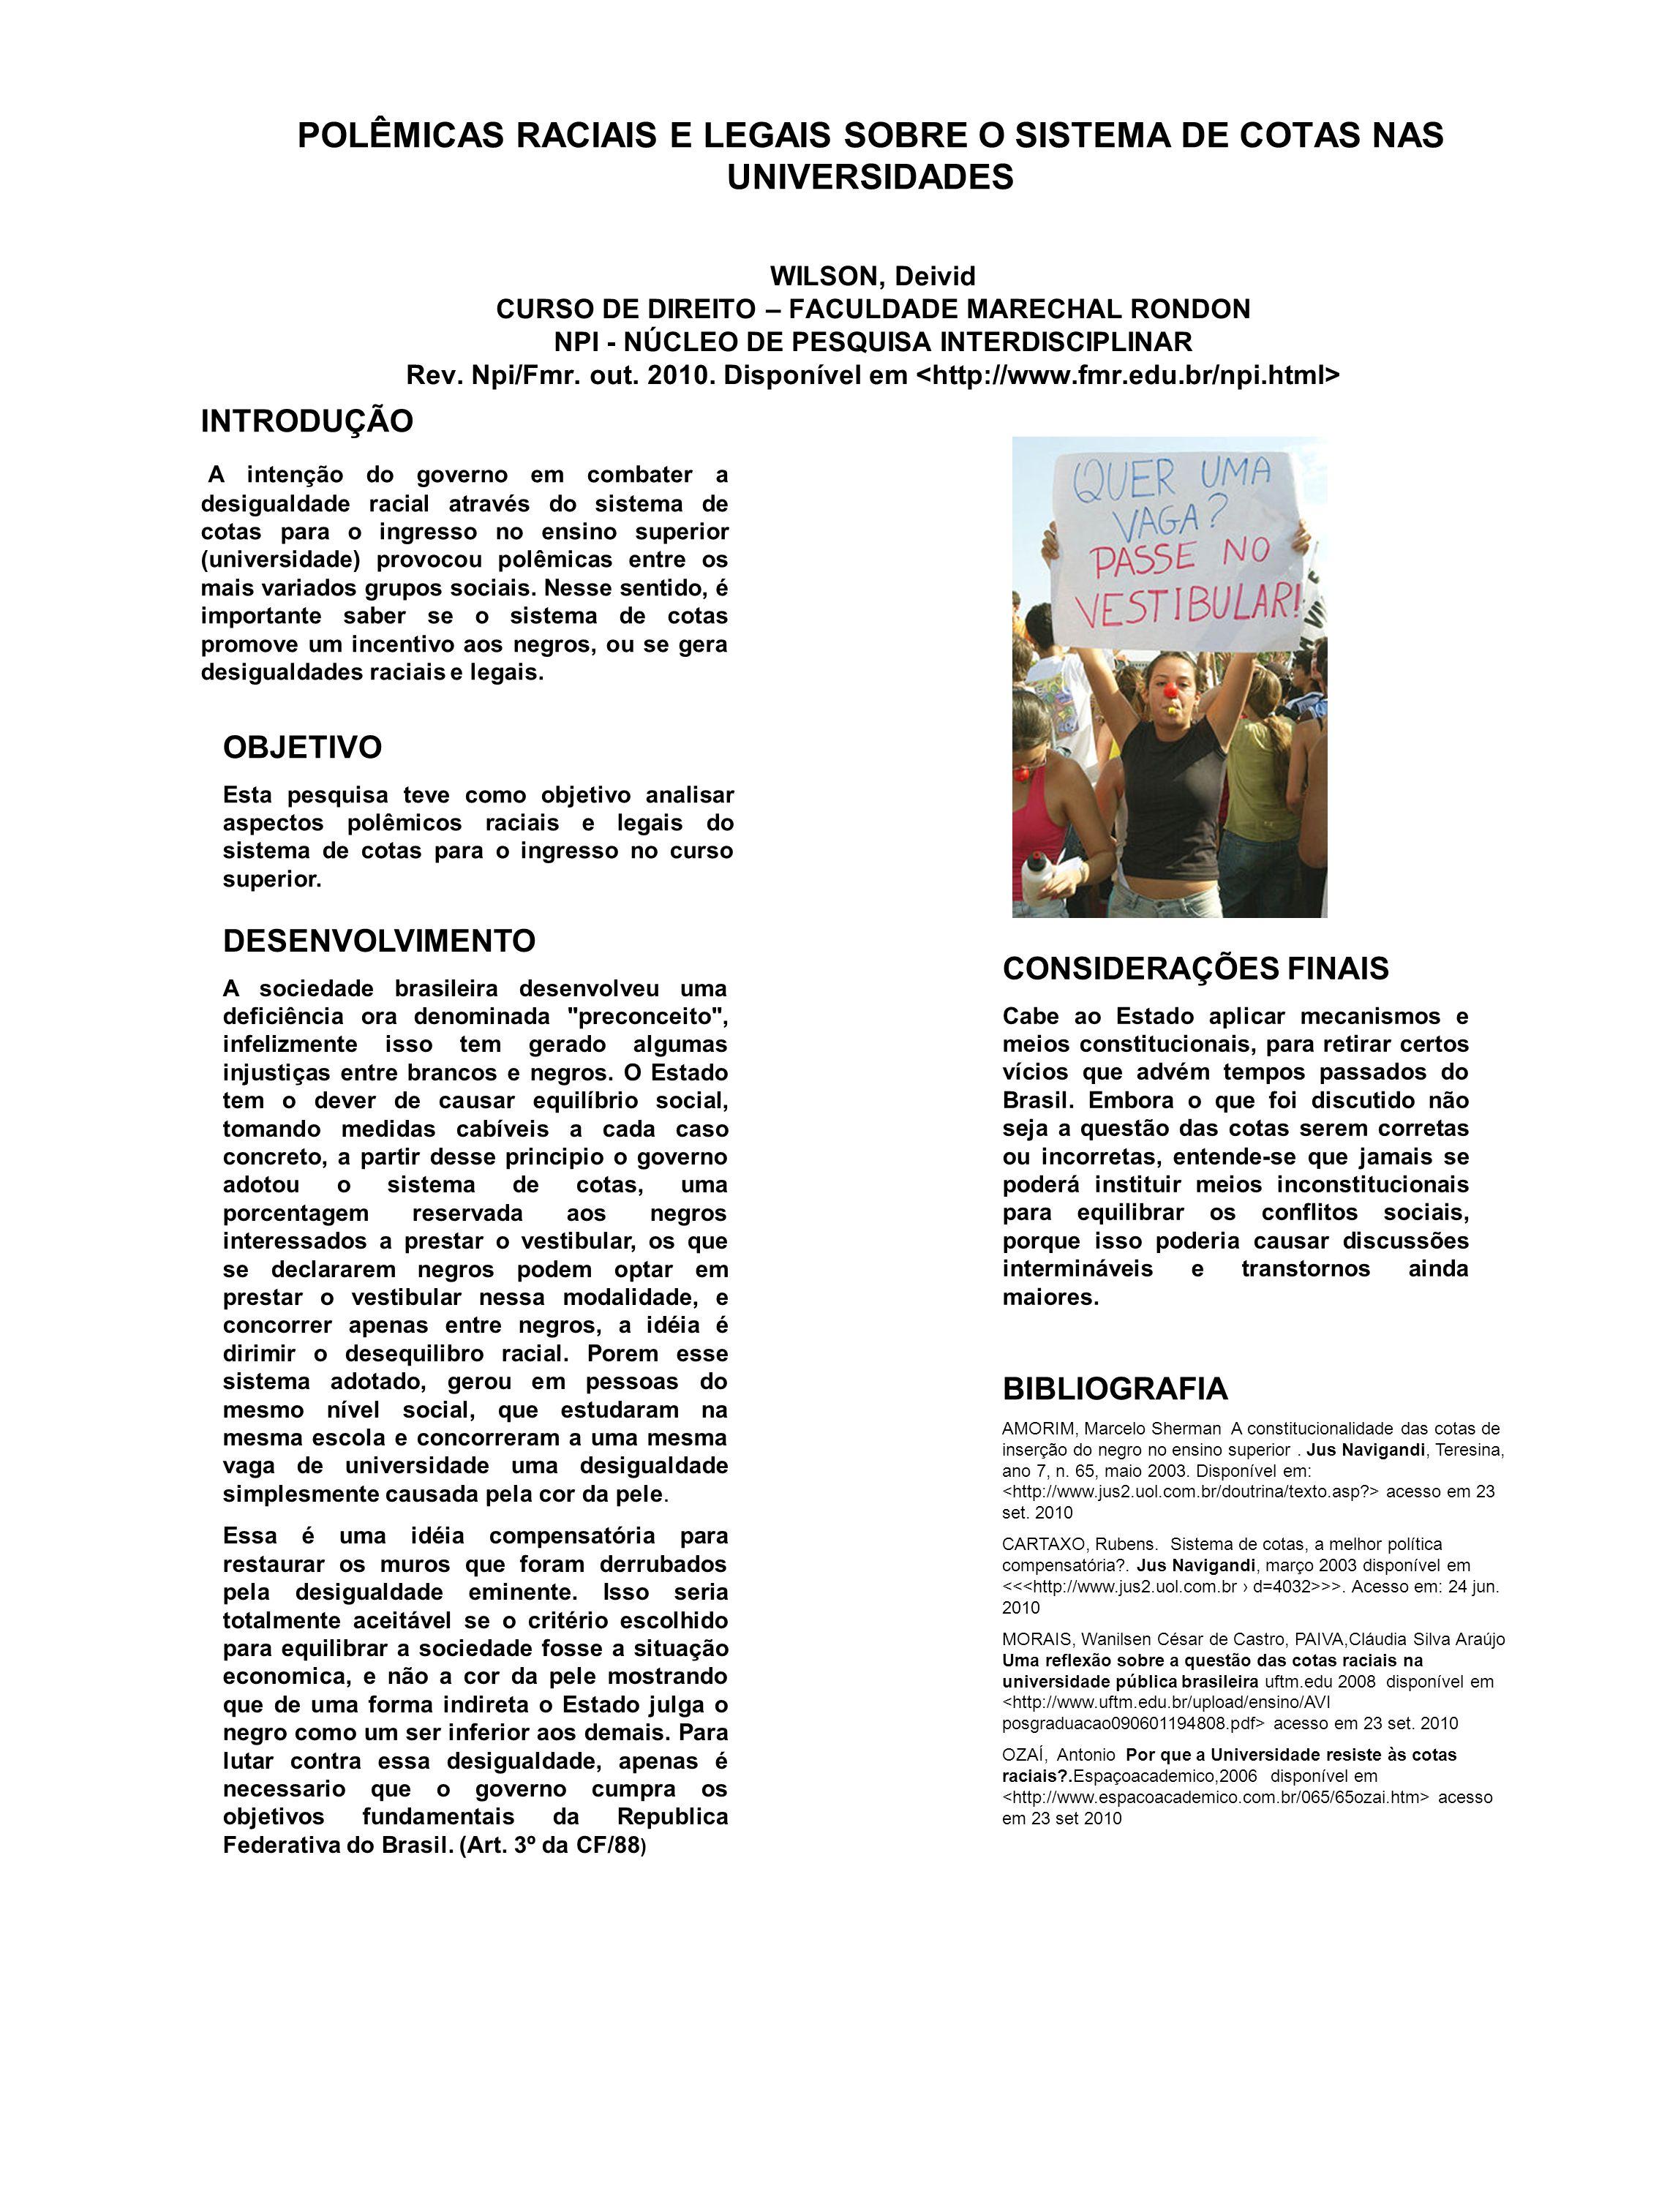 POLÊMICAS RACIAIS E LEGAIS SOBRE O SISTEMA DE COTAS NAS UNIVERSIDADES WILSON, Deivid CURSO DE DIREITO – FACULDADE MARECHAL RONDON NPI - NÚCLEO DE PESQ